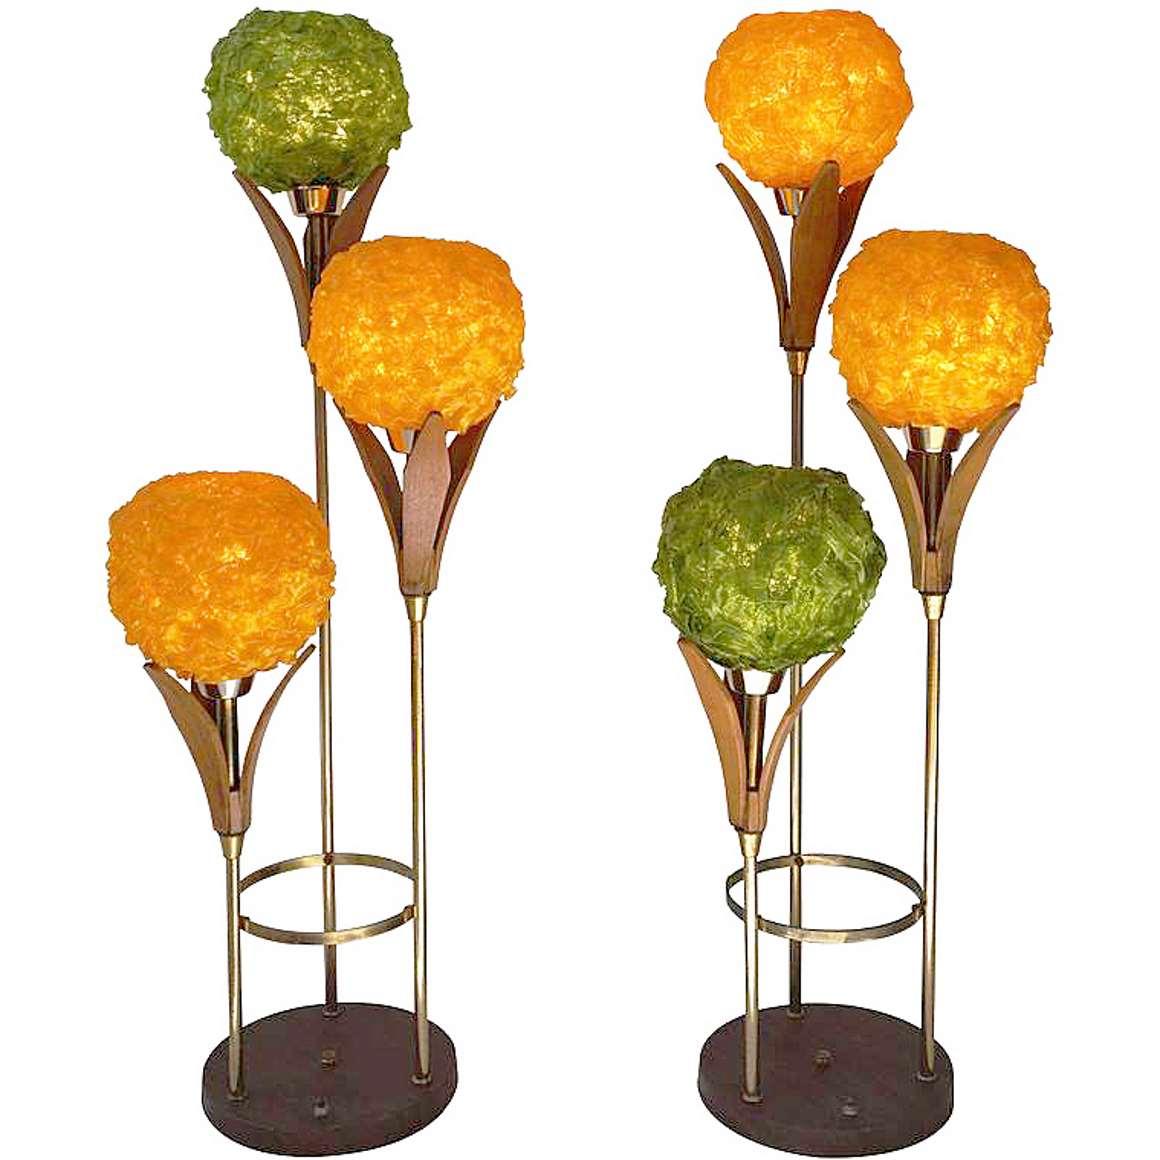 Lampcraft Industries swag flowers floor lamp spaghetti plastic Deena Products MCM Mid-Century Modern 1950s 1960s